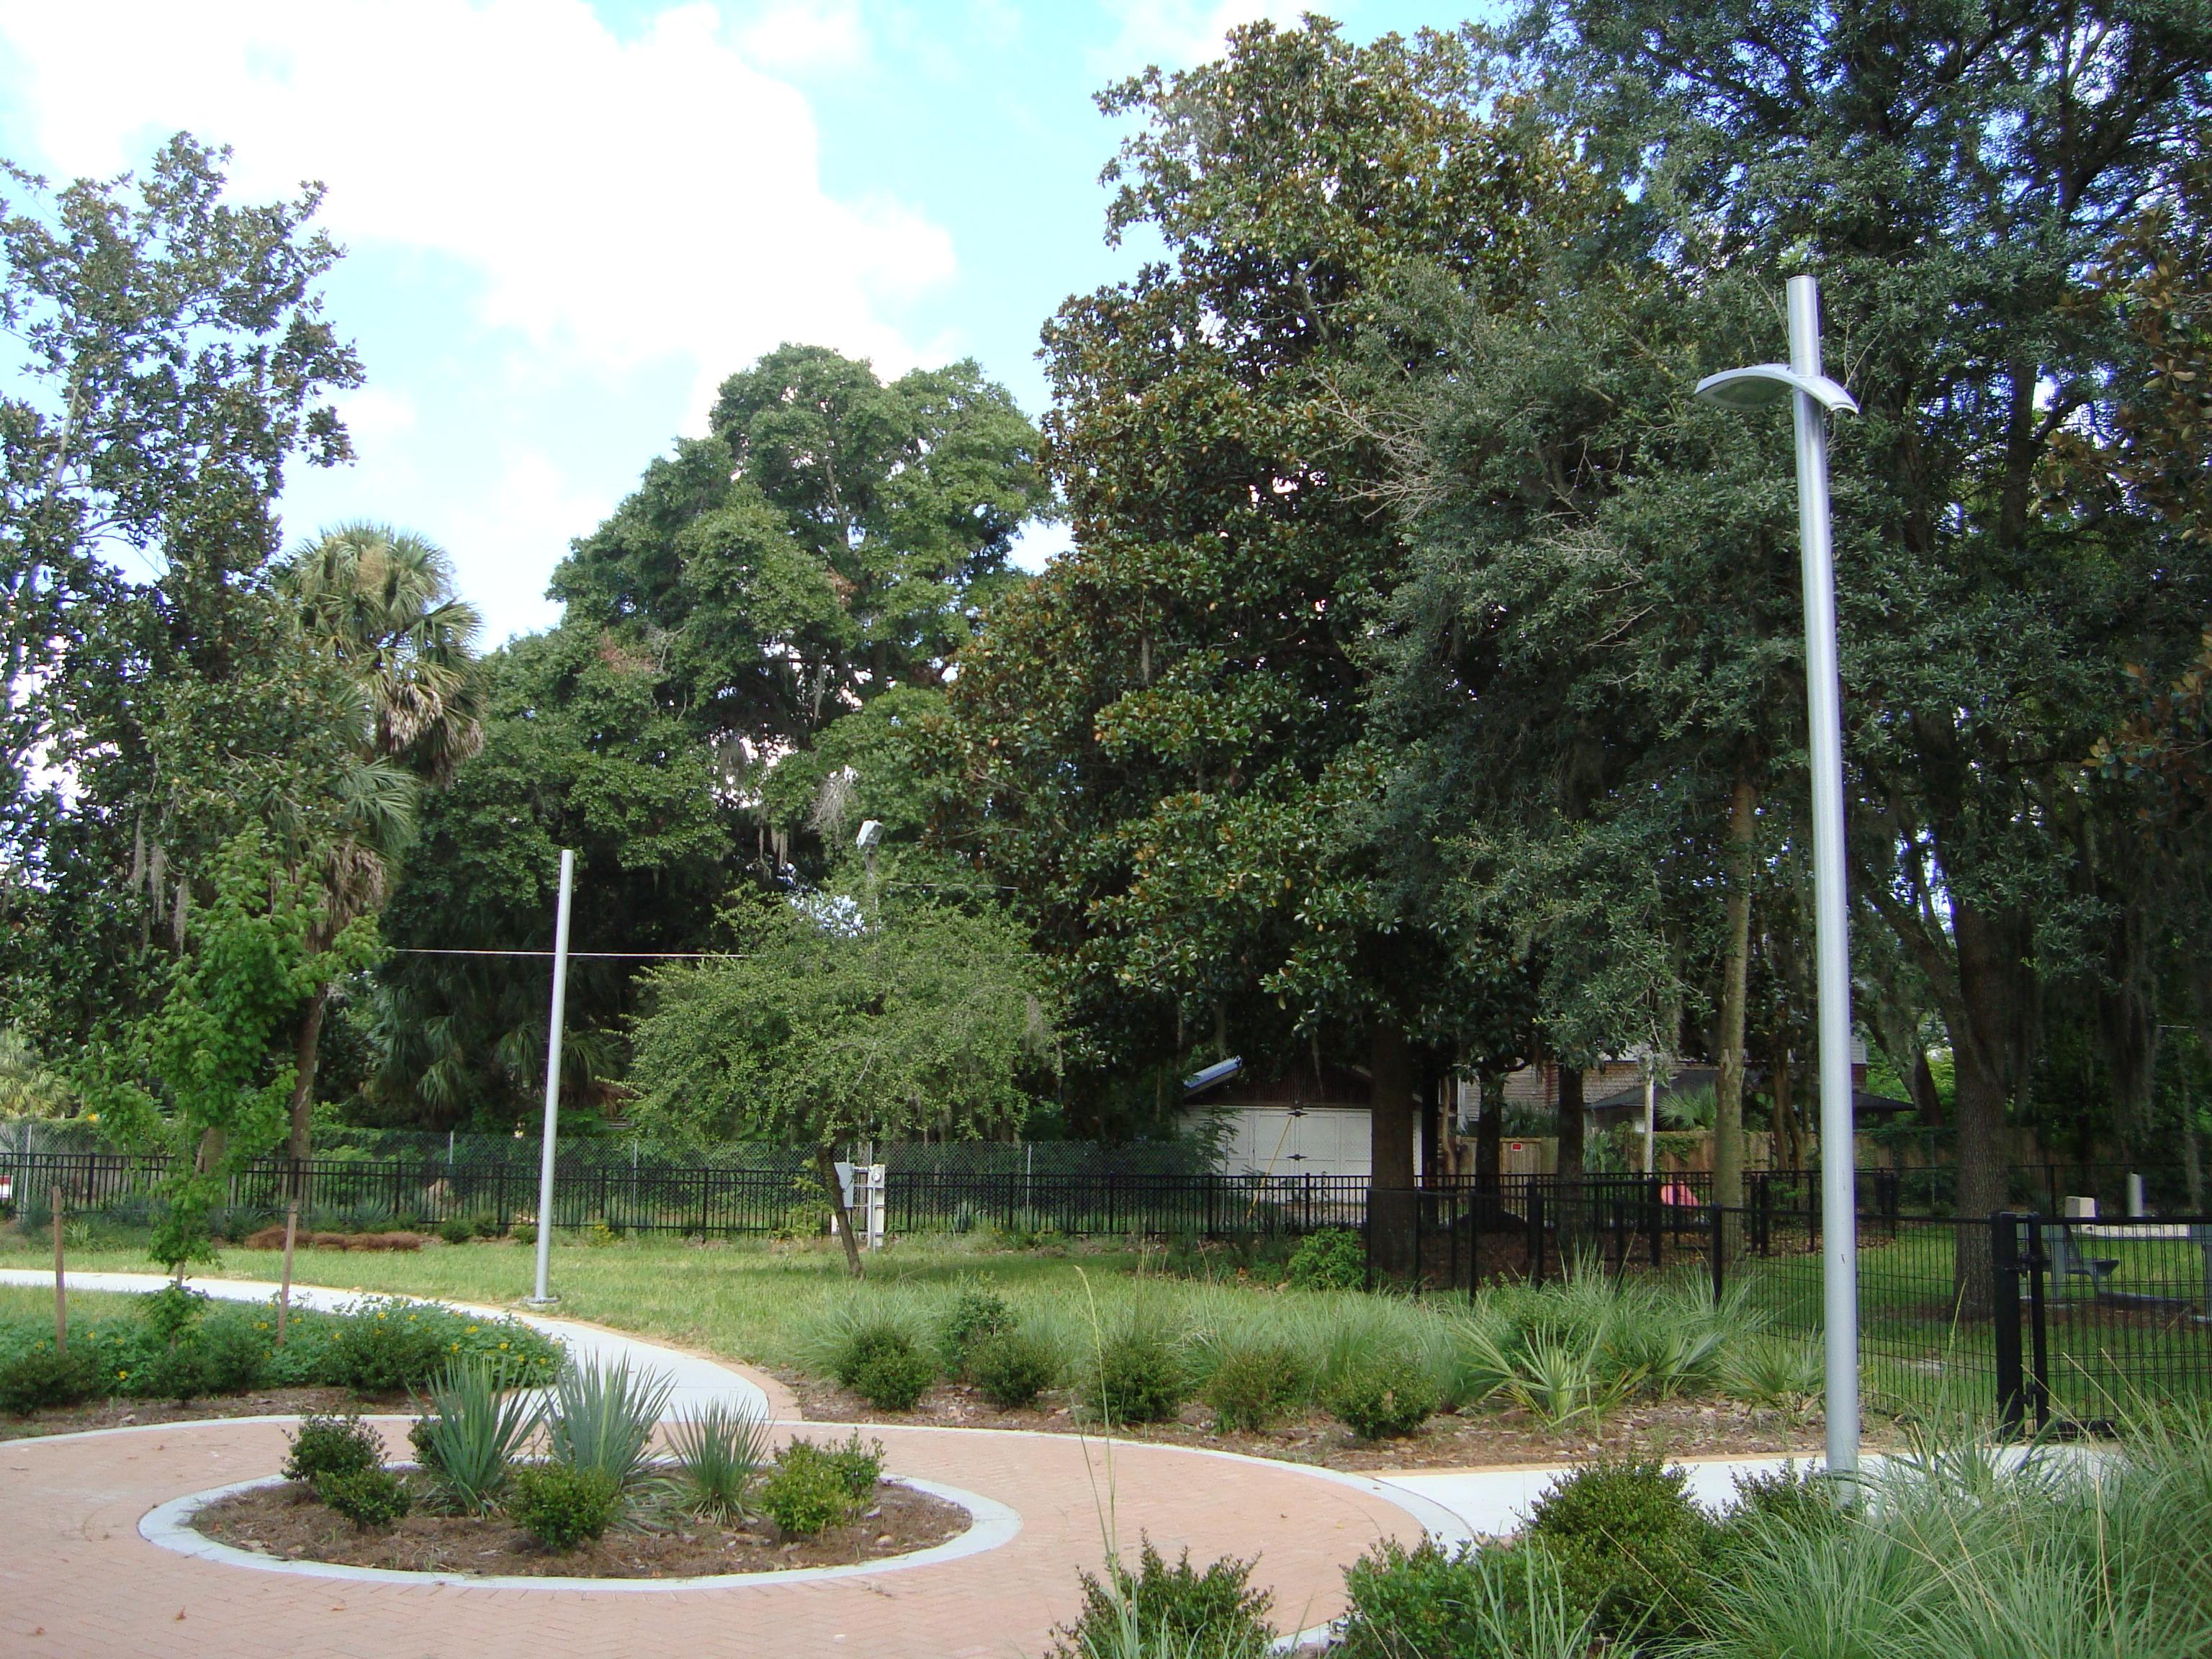 Lynch Park